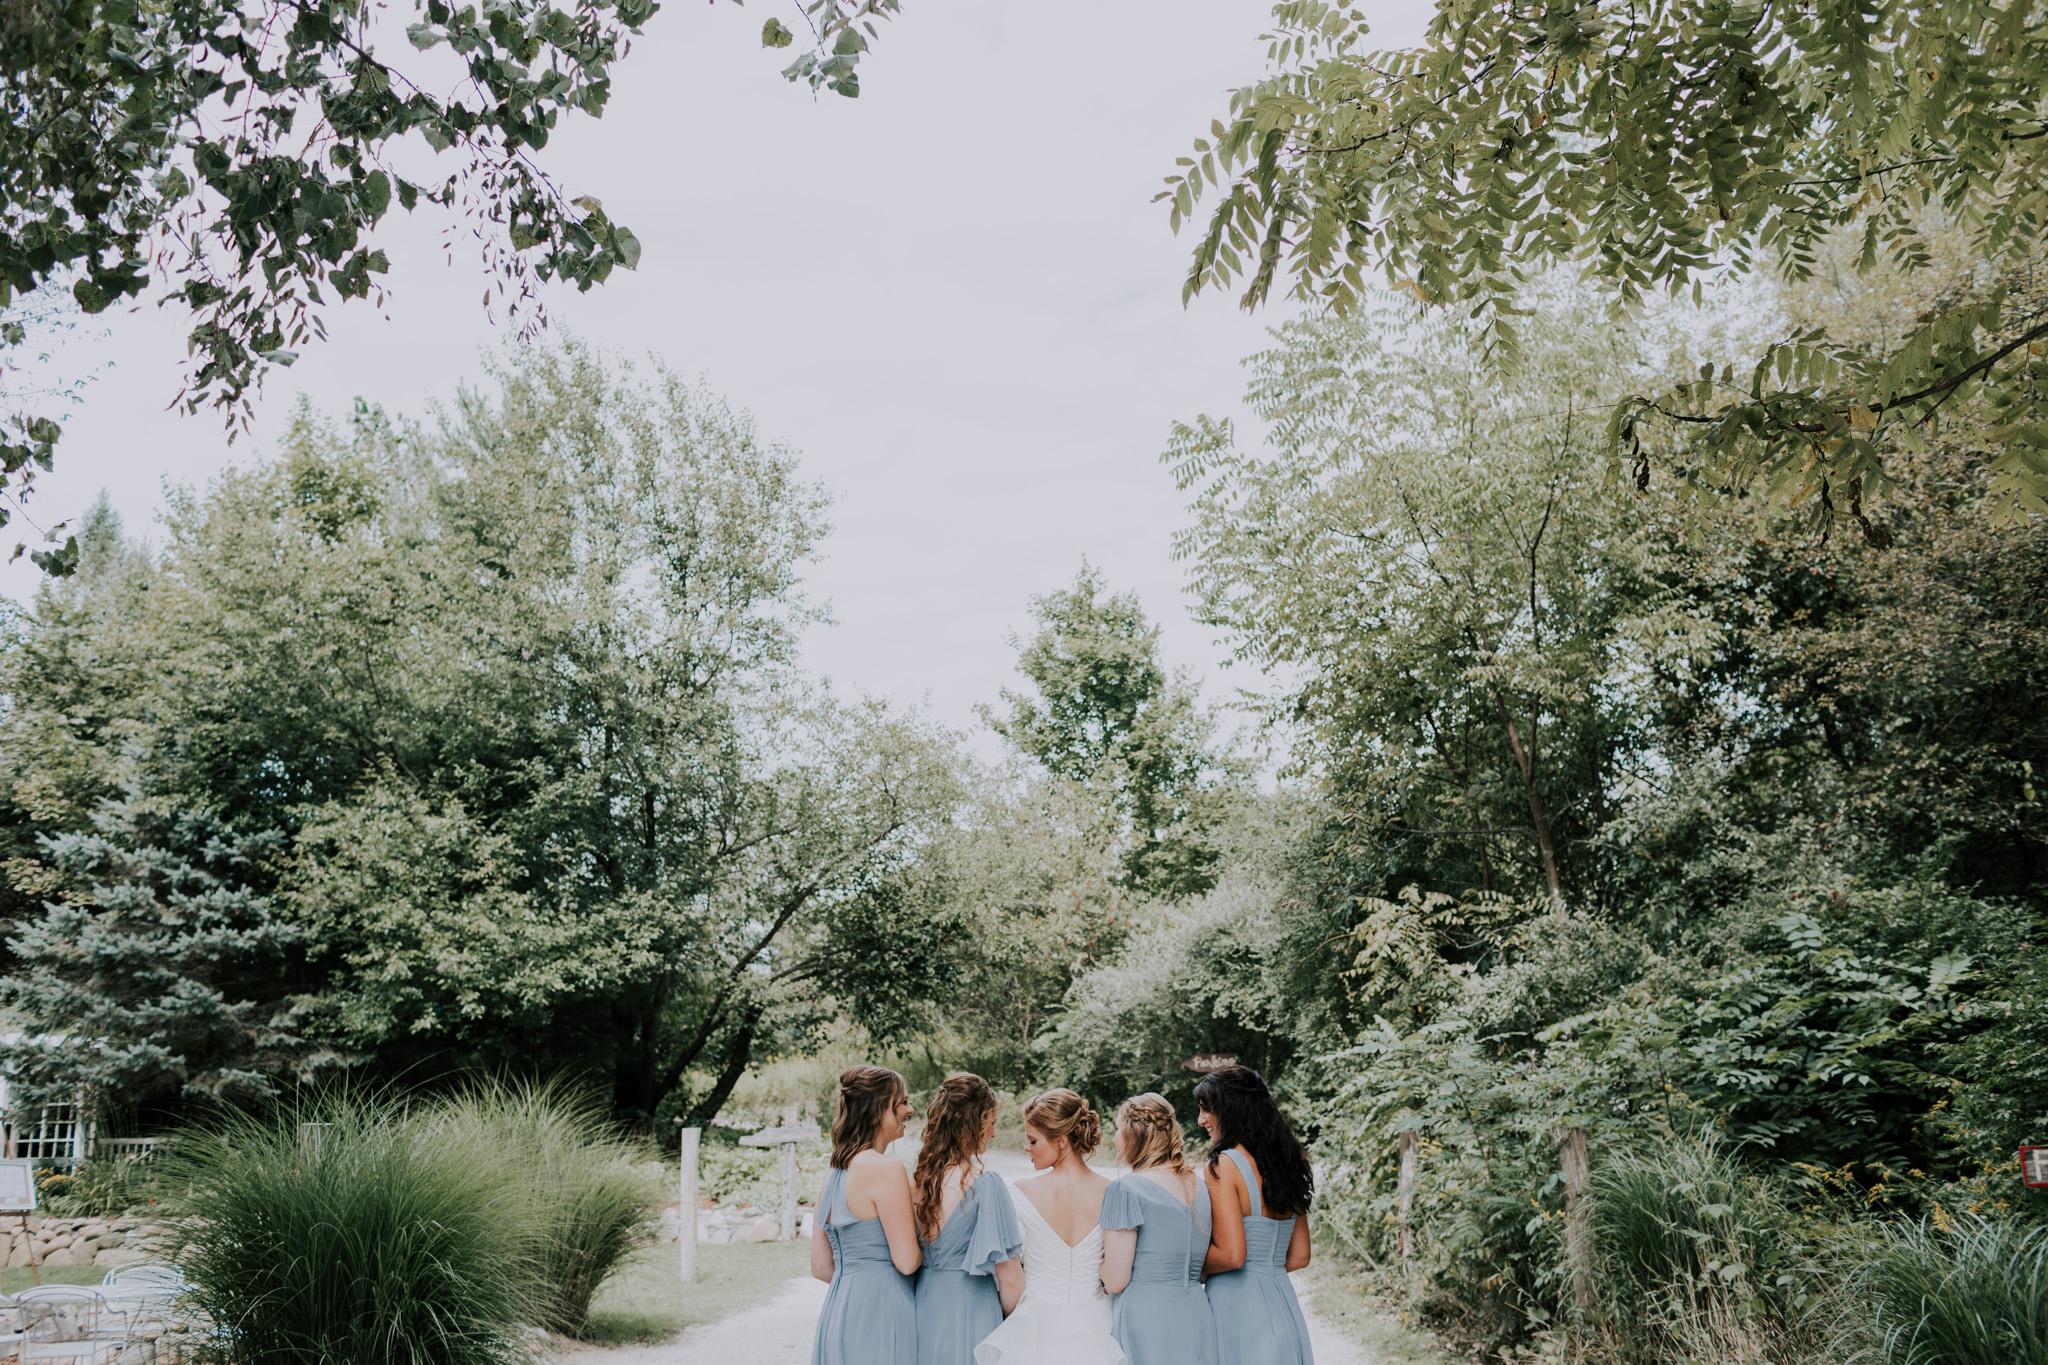 MillCreek-Wilde-Wedding-Barn-Michigan-Eliza-Eric-Vafa-Photo526.jpg